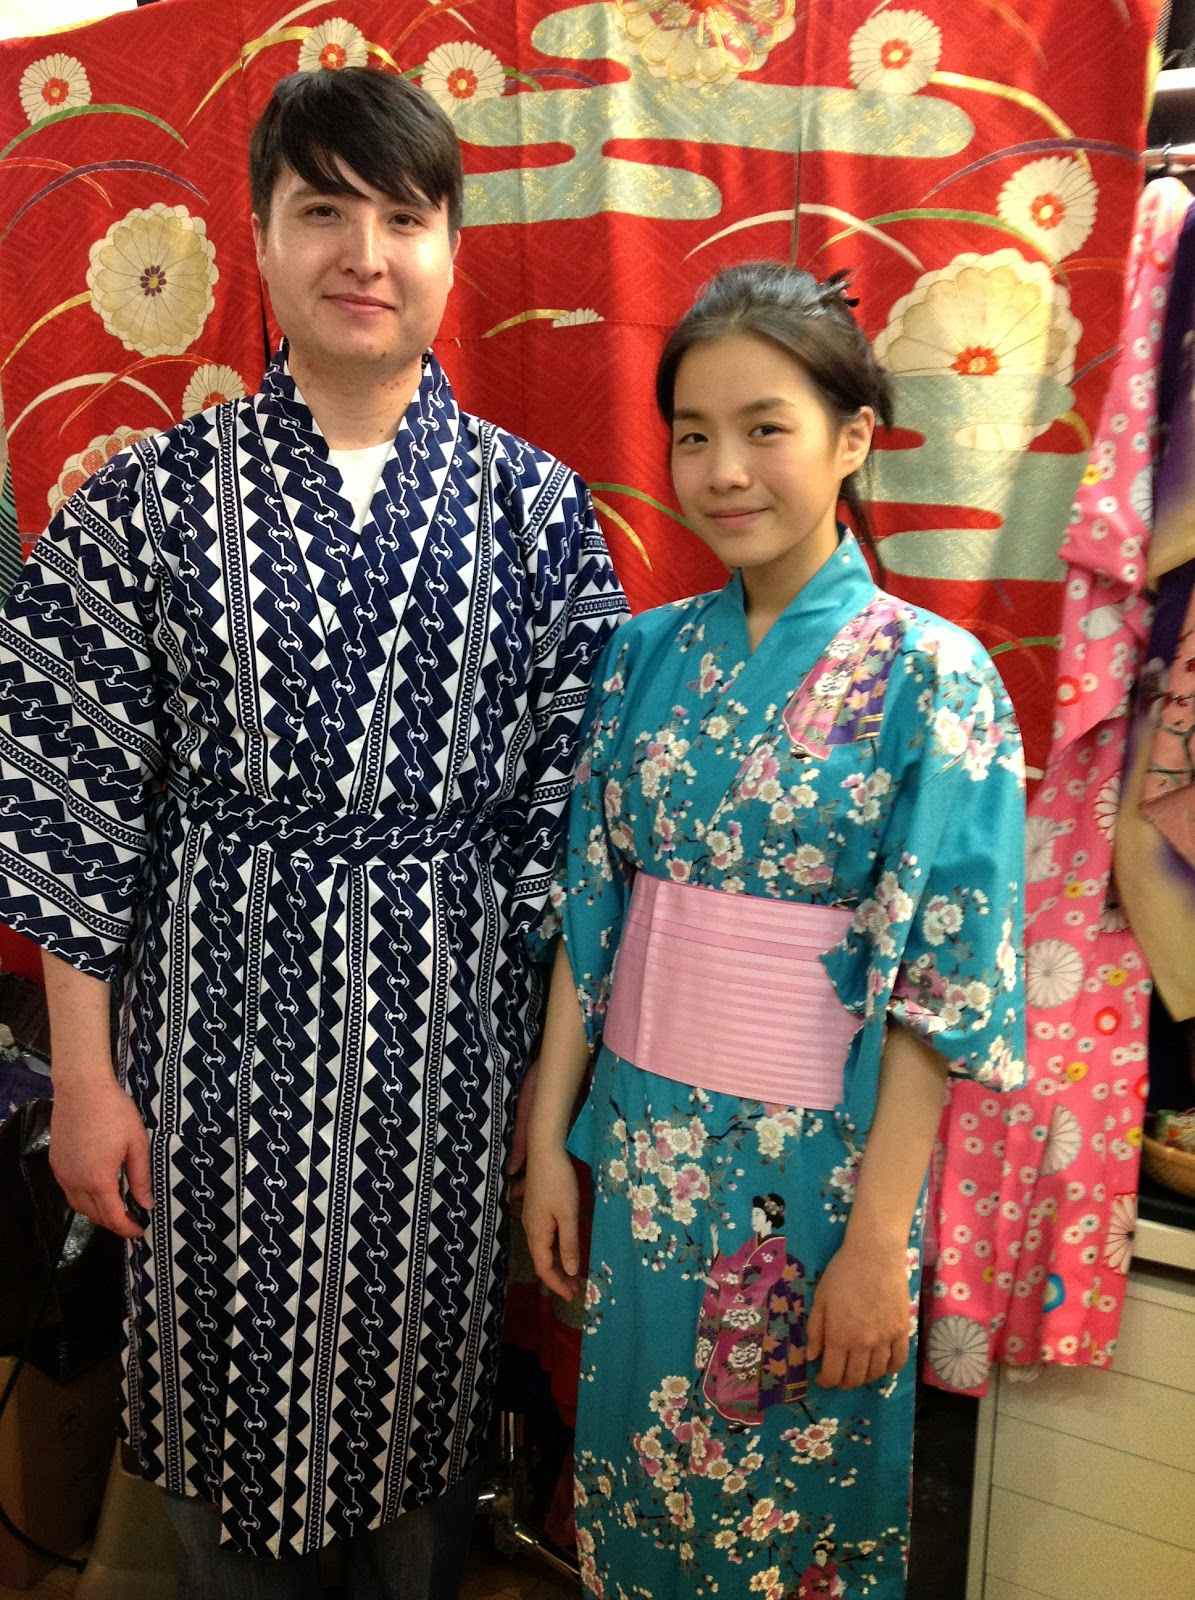 kimono robe new york city